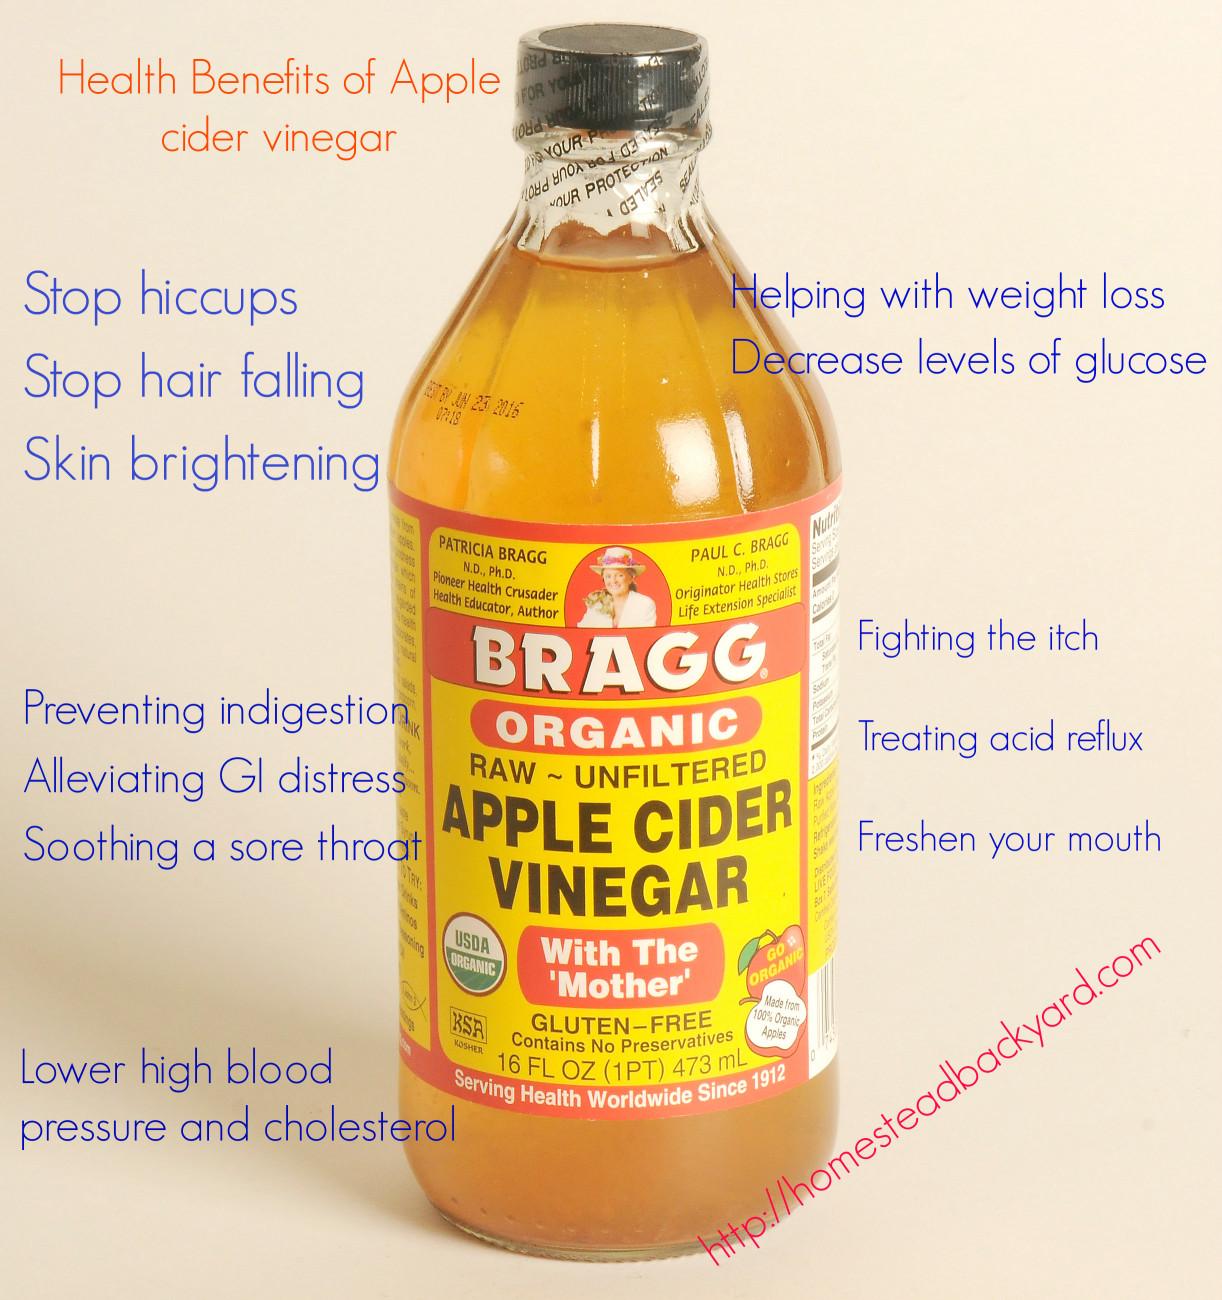 Benefits Of Apple Cider Vinegar  Health Benefits of Apple cider vinegar